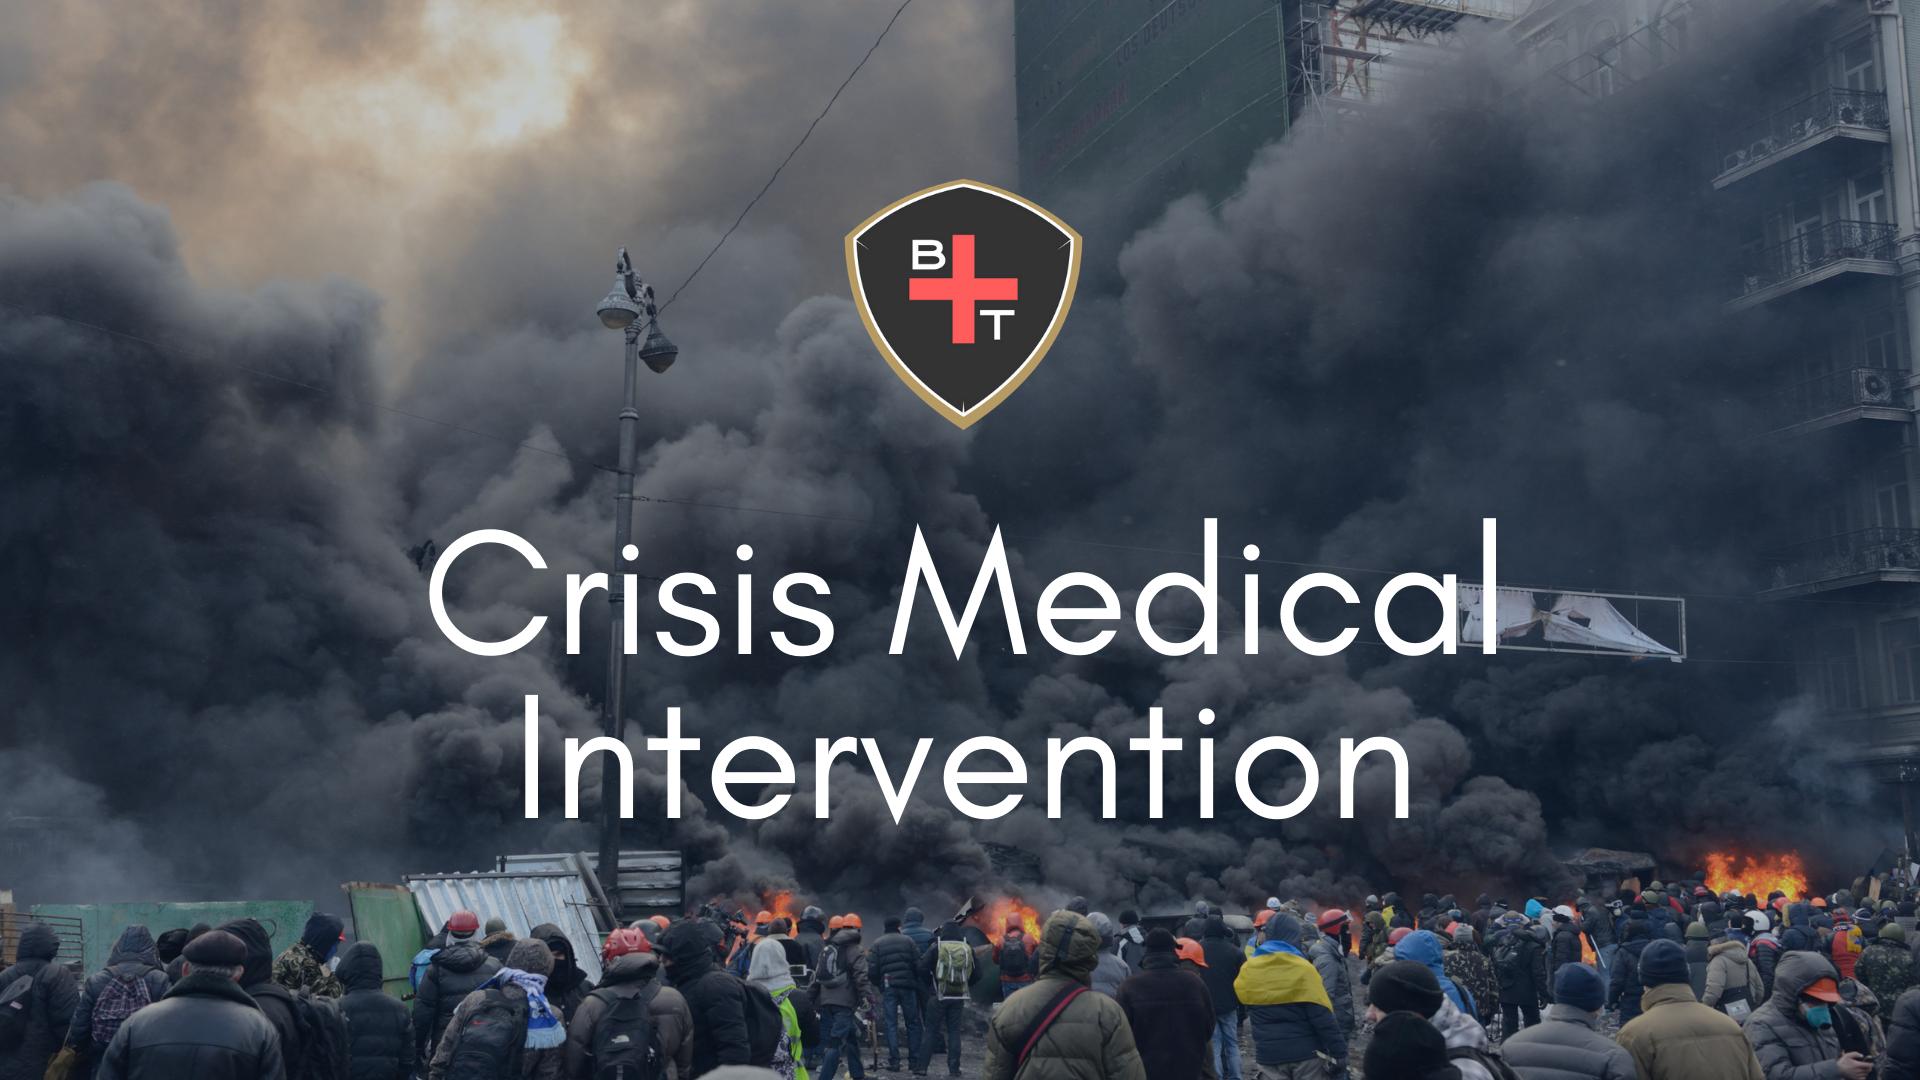 crisis-medical-intervention-better-tactics-usa.jpg